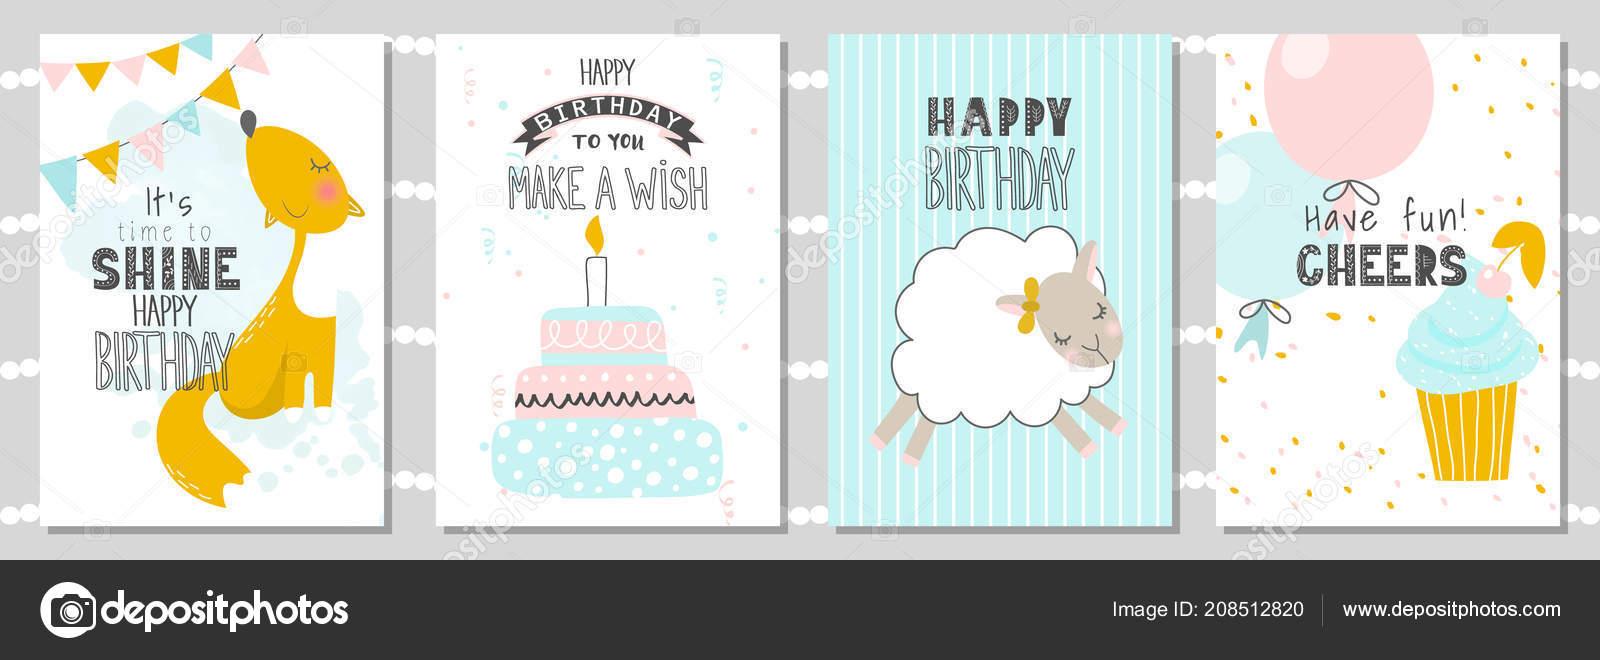 Fabulous Set Birthday Greeting Cards Party Invitation Templates Cute Fox Funny Birthday Cards Online Fluifree Goldxyz